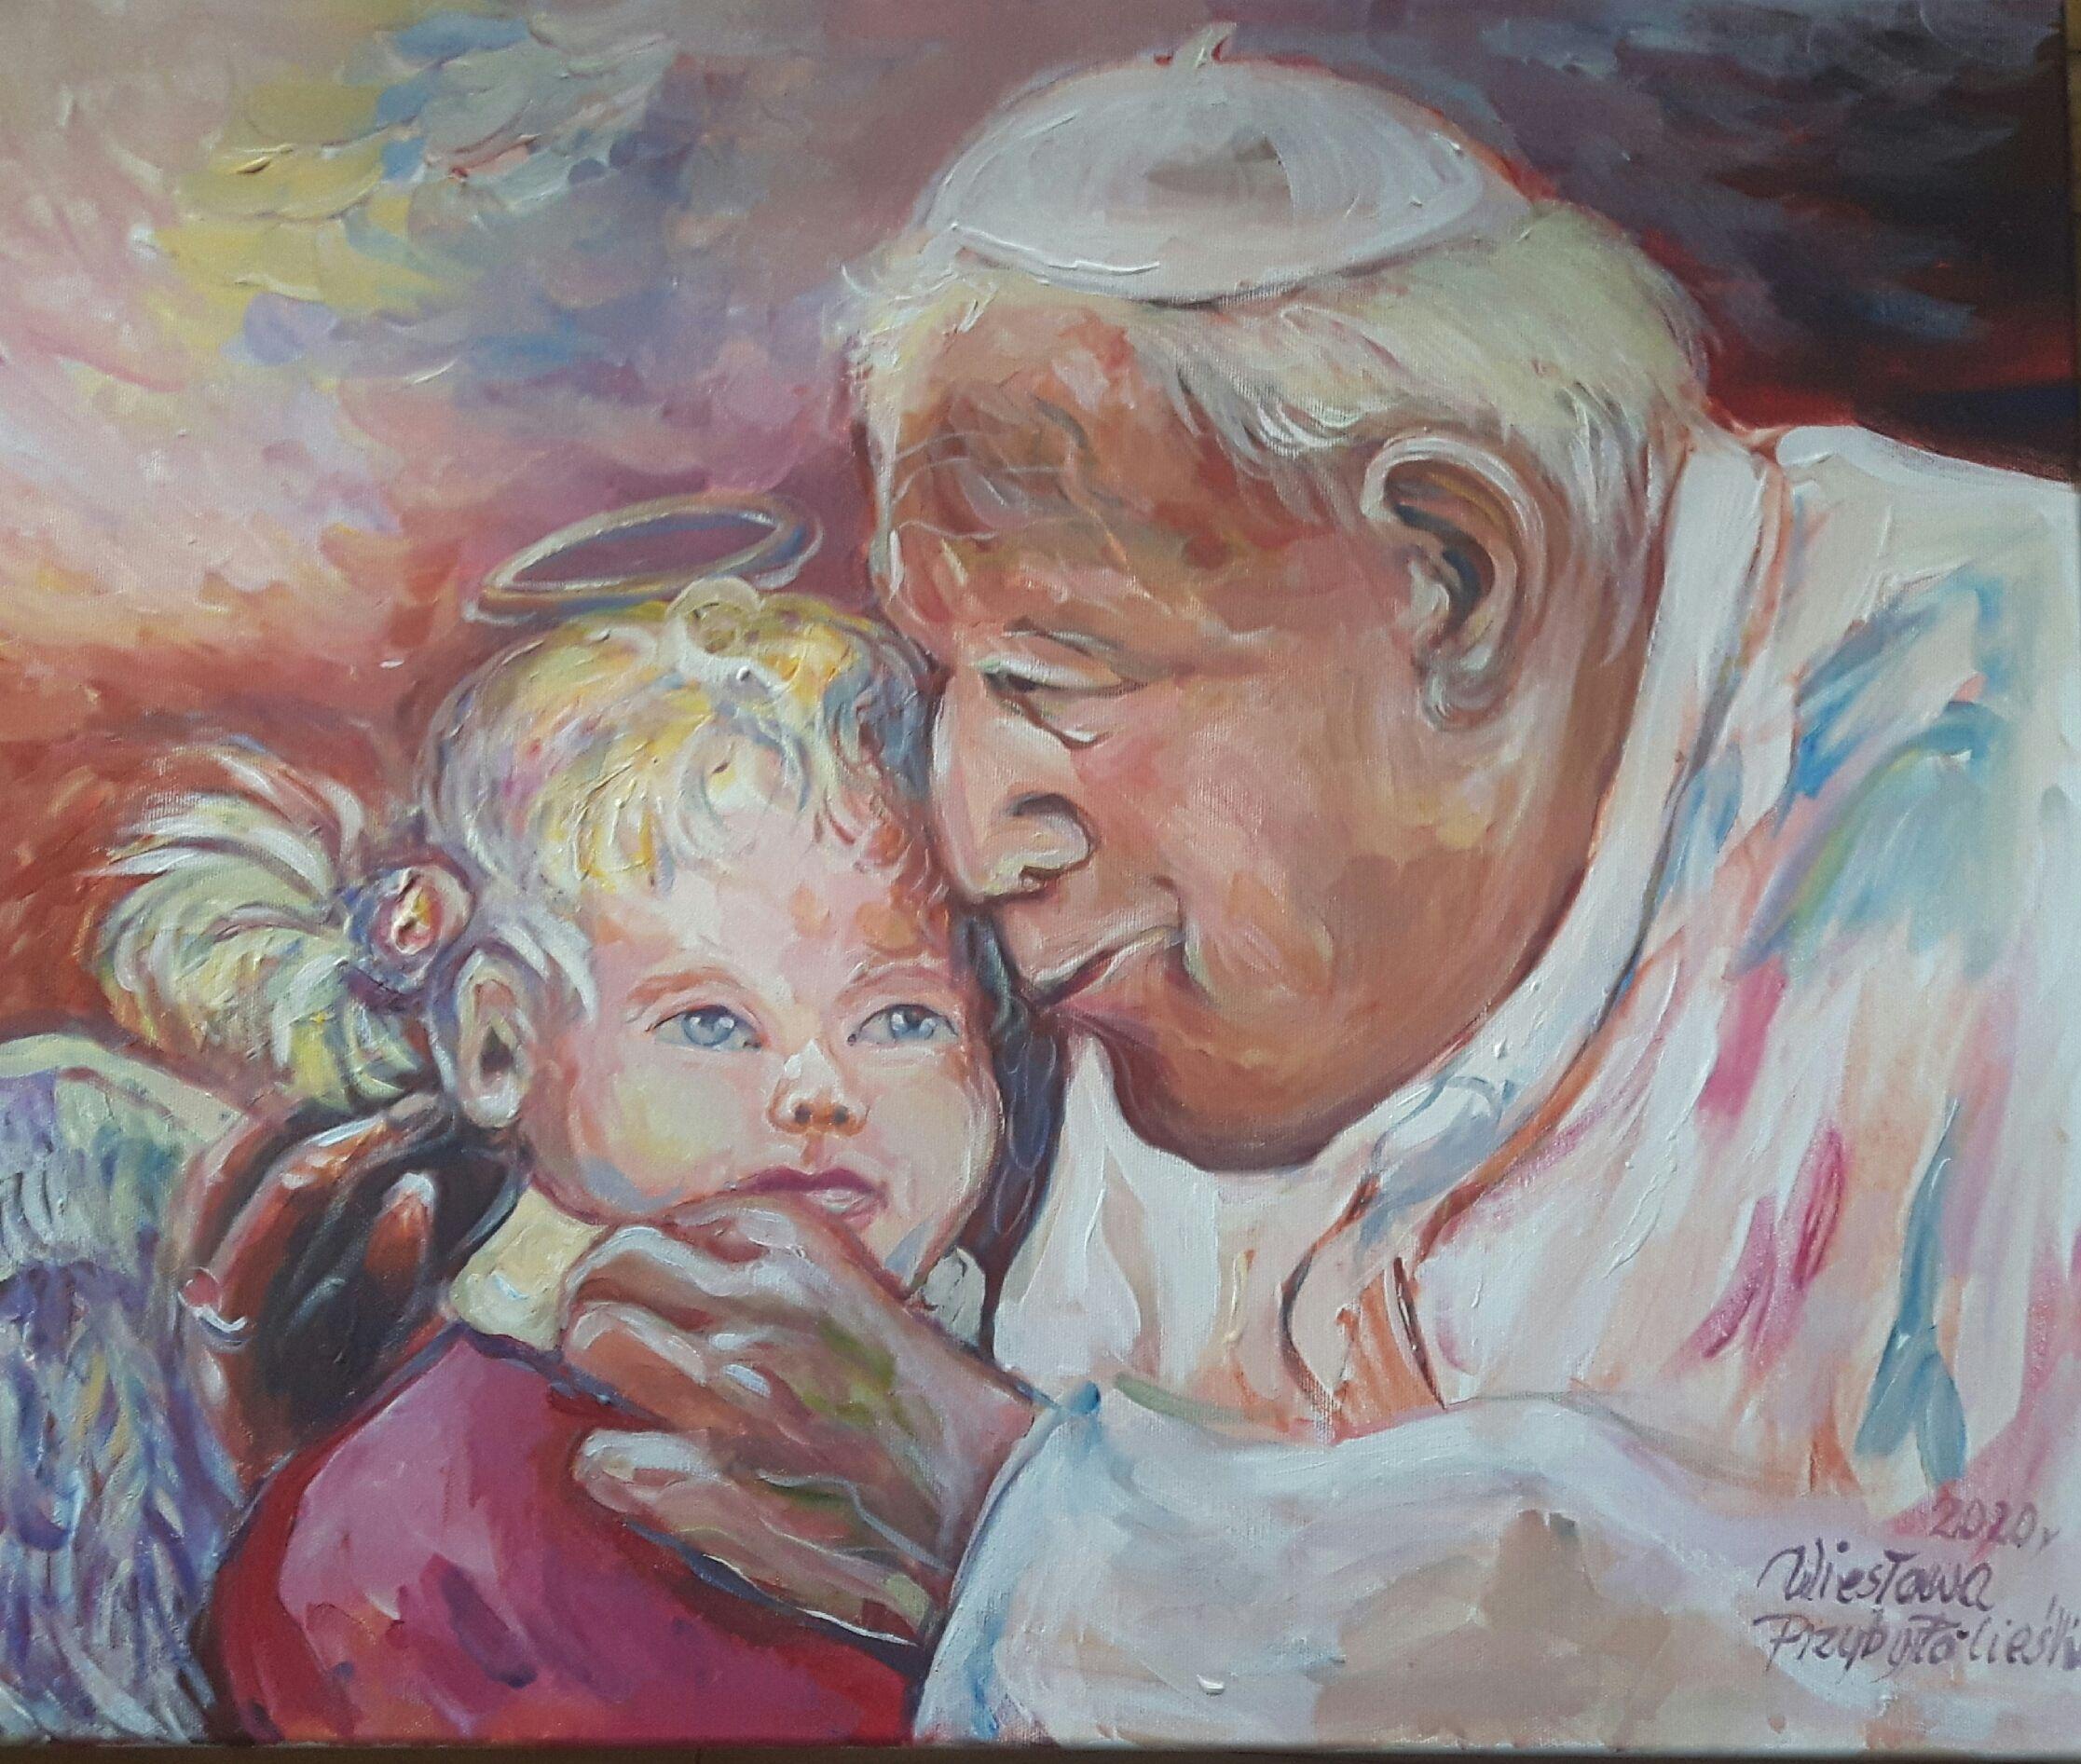 Attachment papież 3.jpg